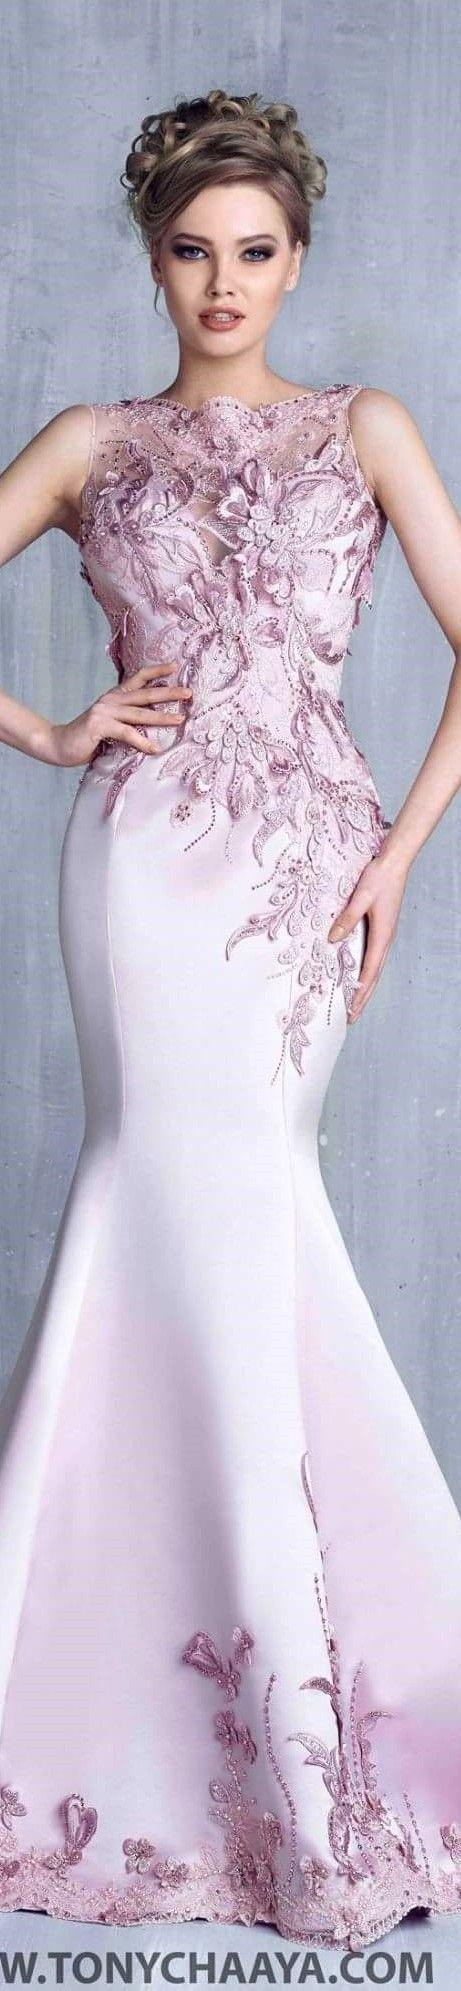 Tony Chaaya couture 2016 party dress